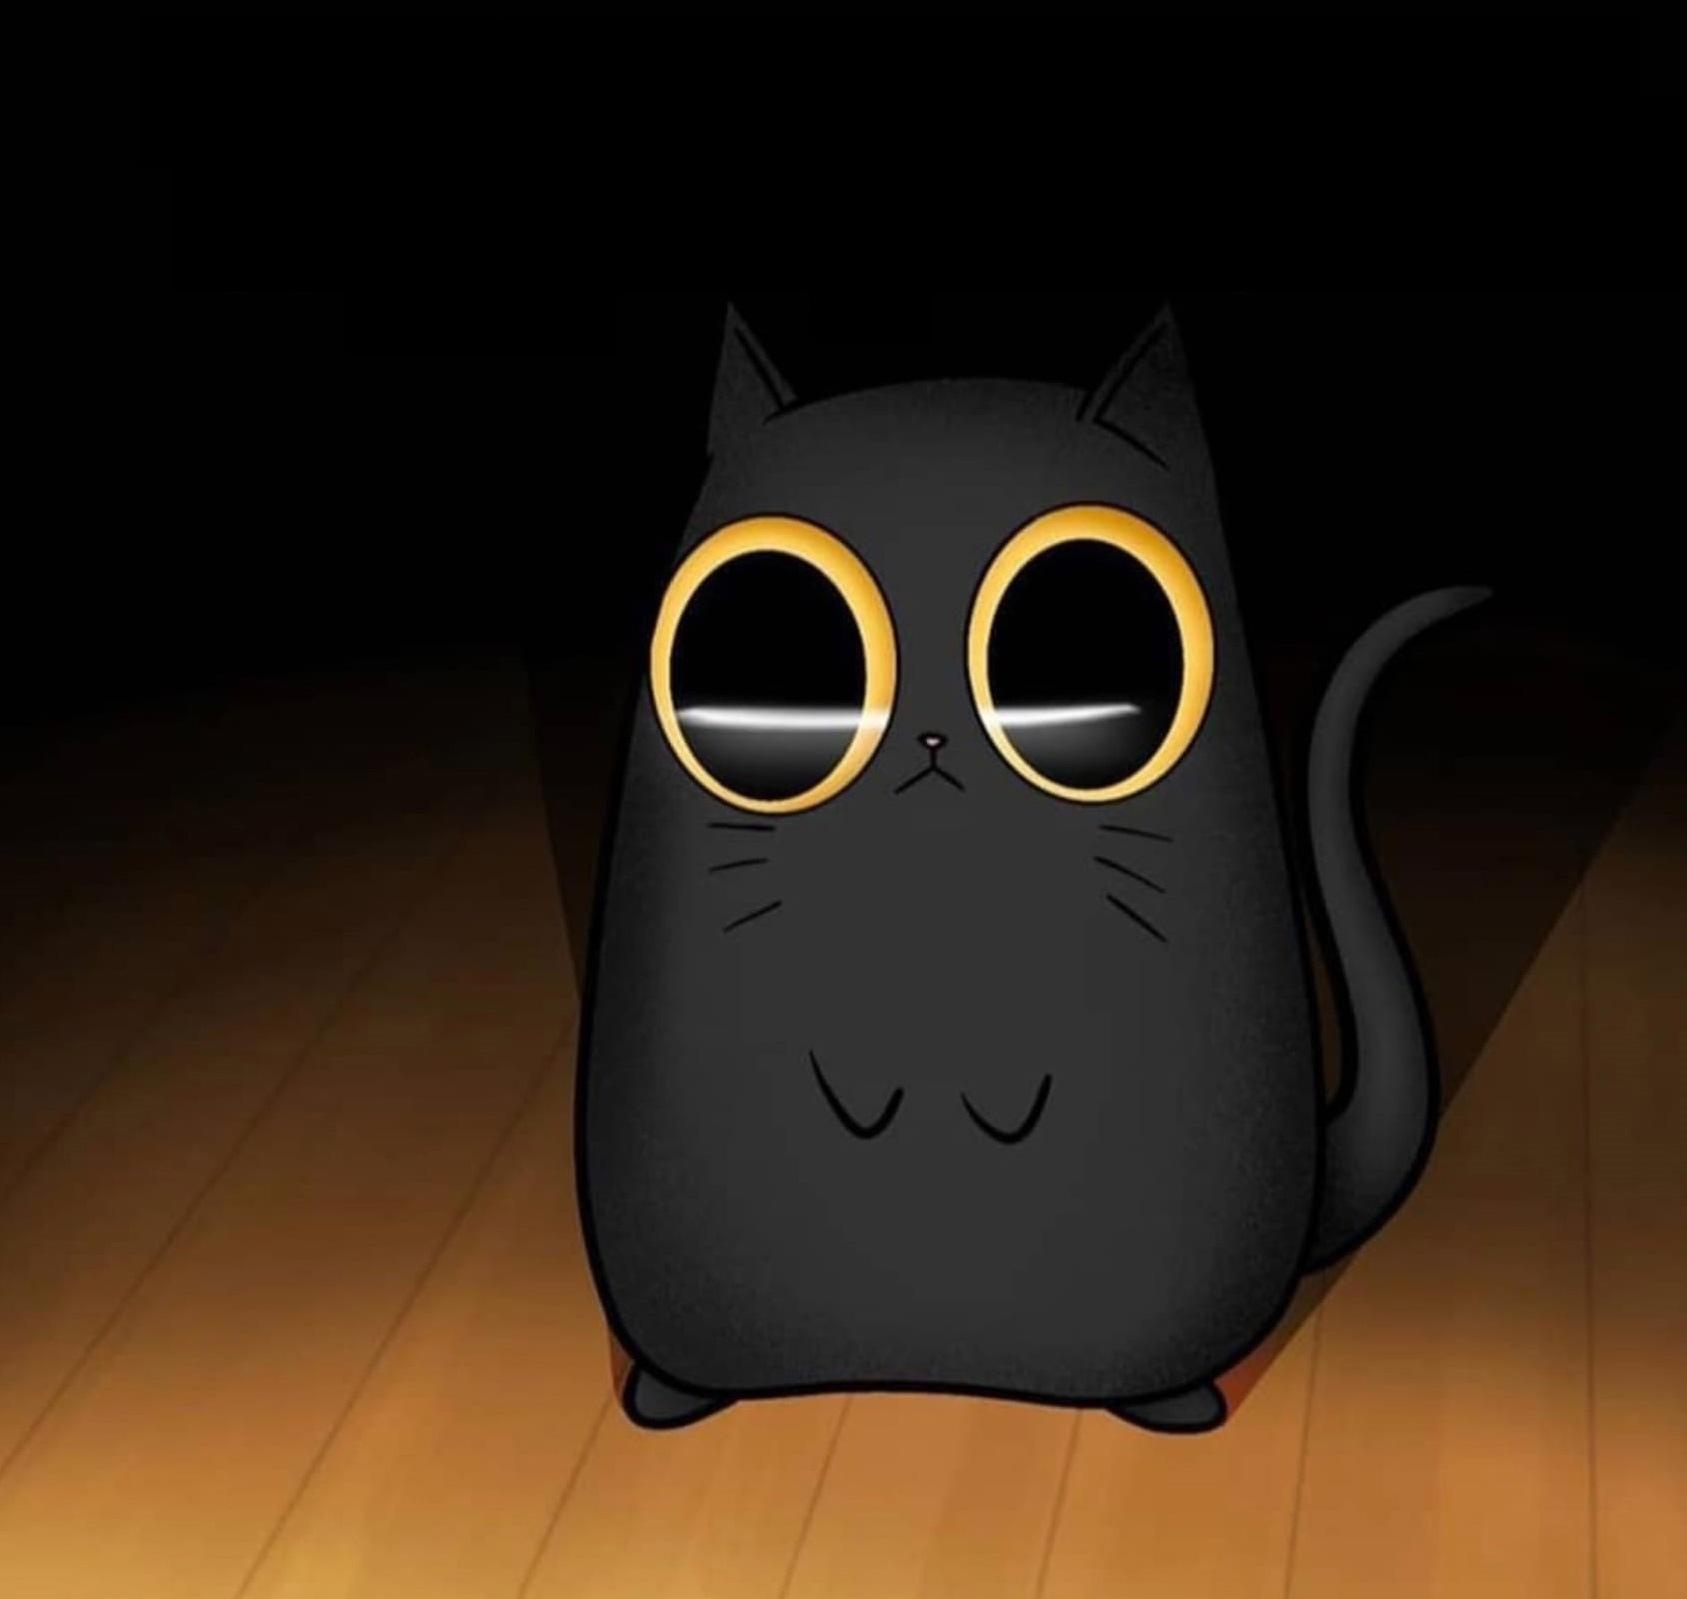 Интересующийся кот